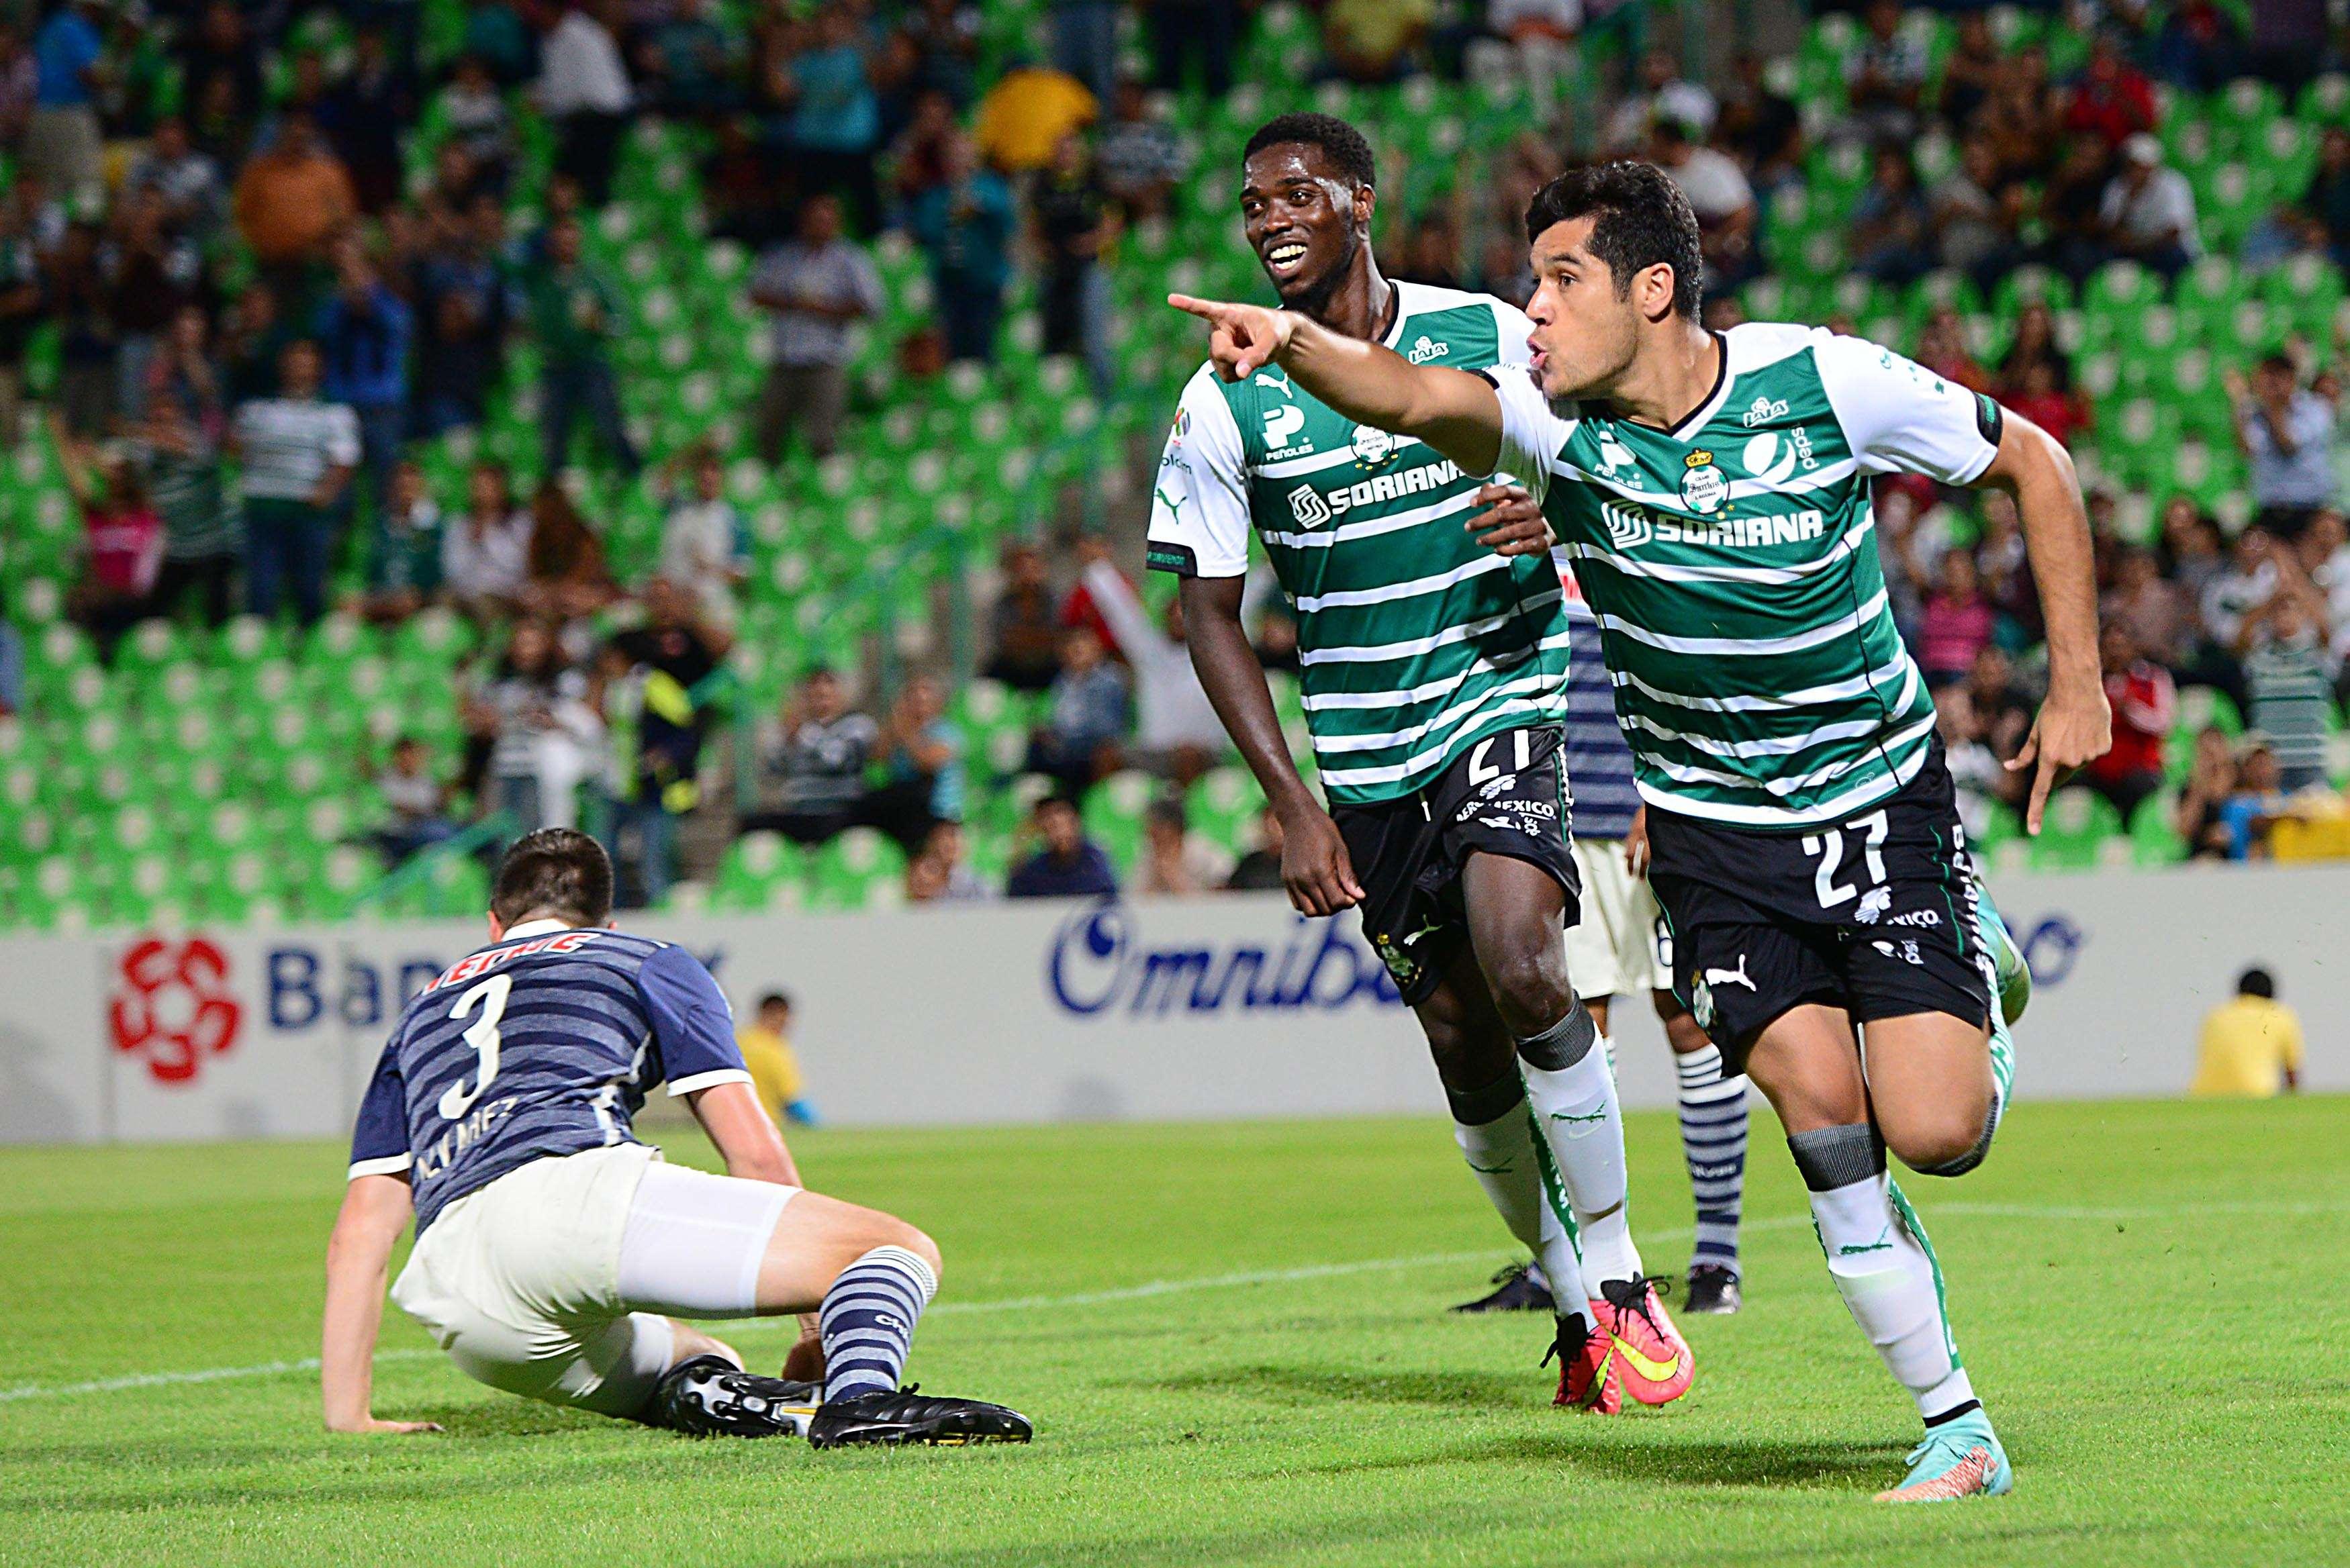 El 'Chuletita' acabó con las Chivas. Foto: Mexsport